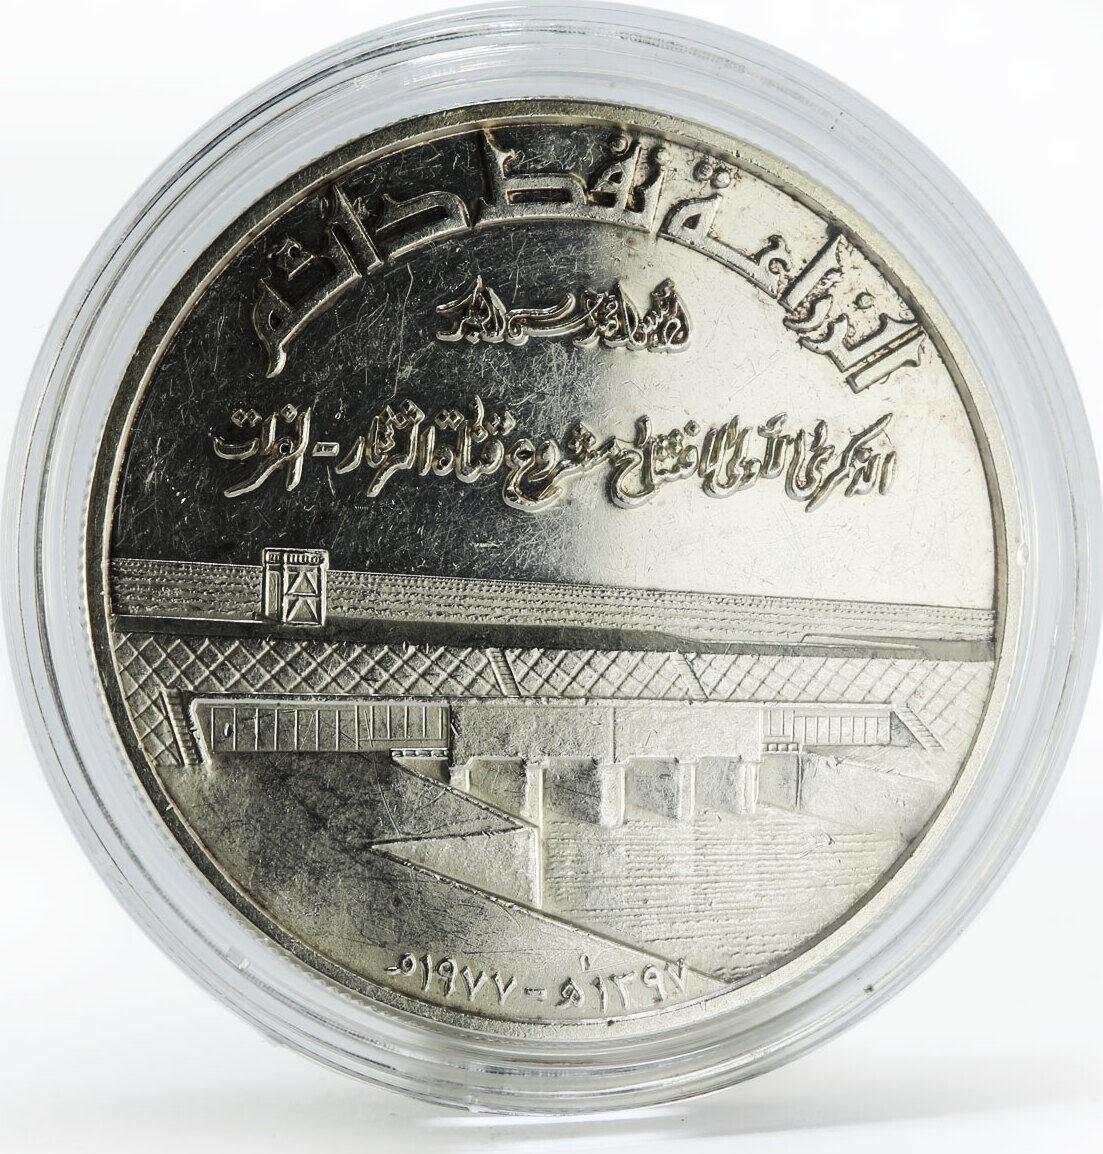 Iraq 1 dinar Tharthar Euphrates Canal proof silver coin 1977